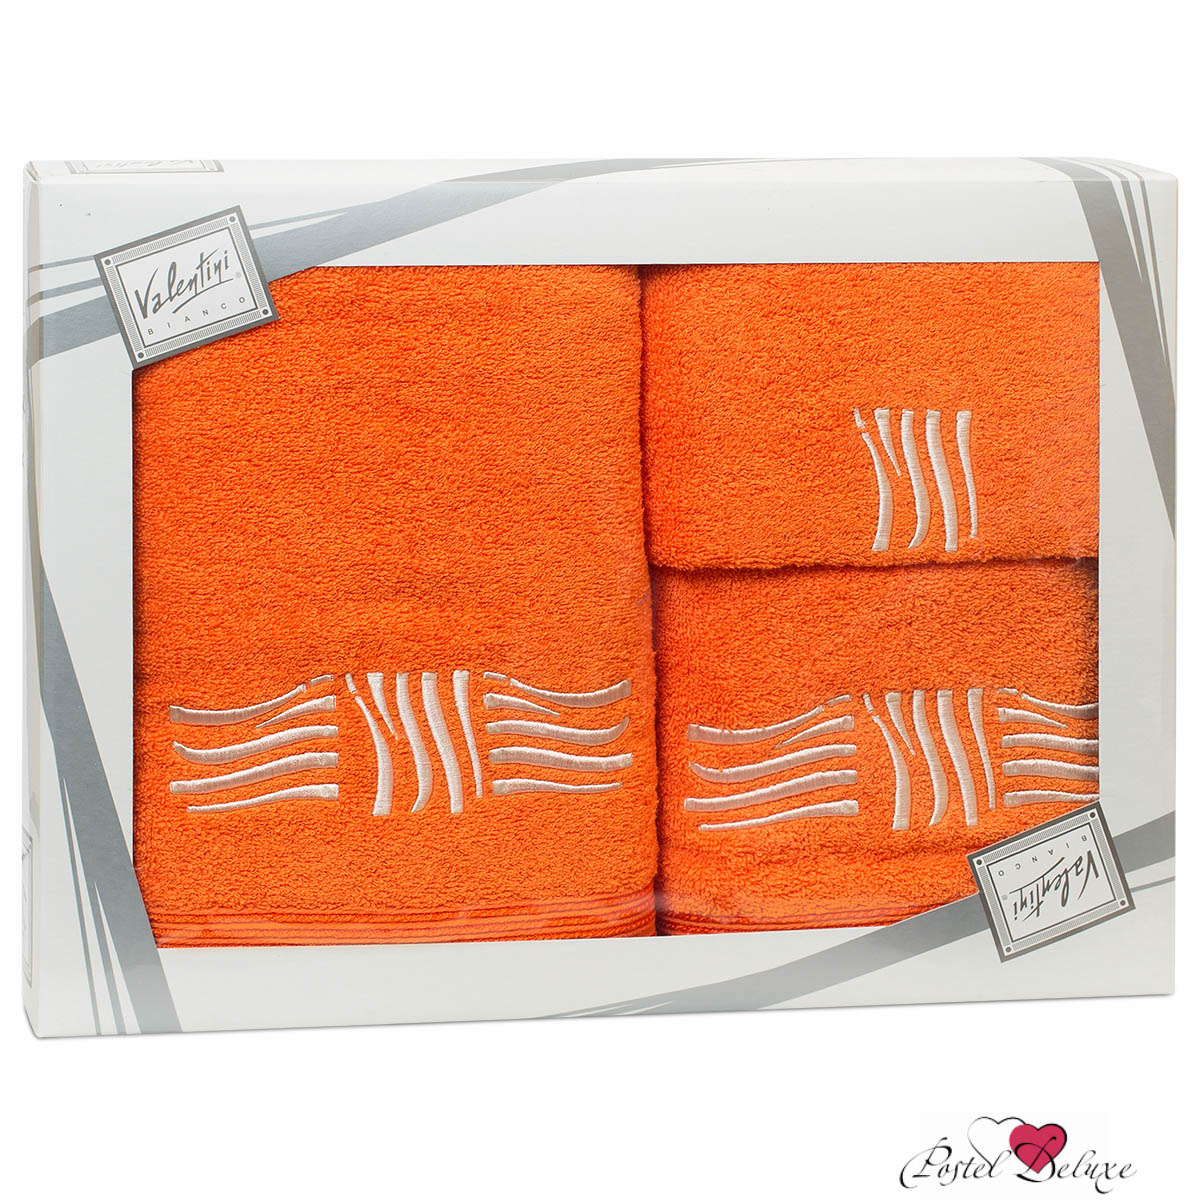 Полотенца Valentini Полотенце Sea Цвет: Оранжевый (Набор) набор из 3 полотенец merzuka sakura 50х90 2 70х140 8432 оранжевый